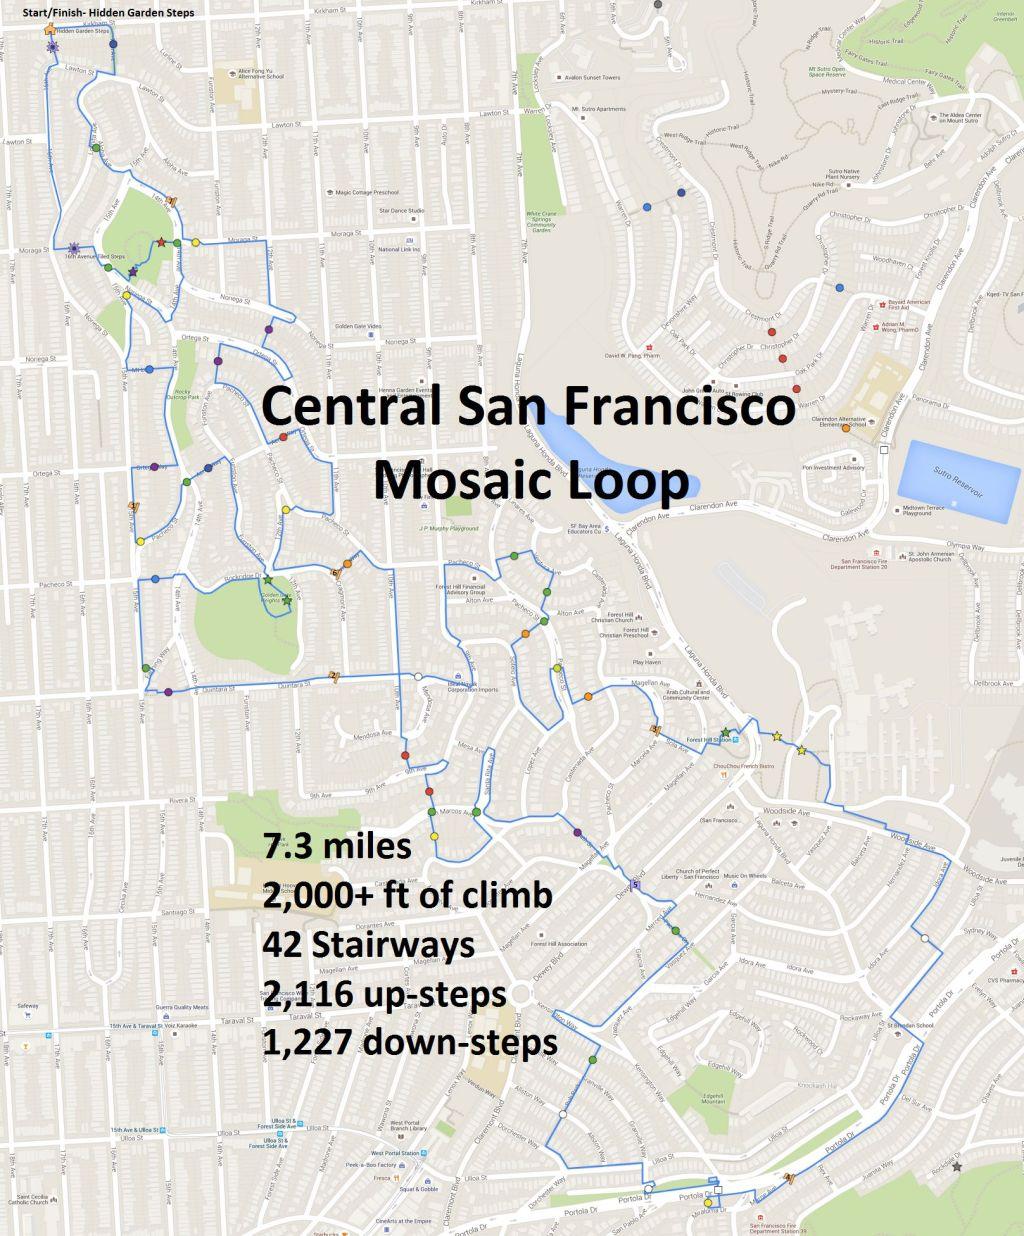 Mosaic Loop Google Map